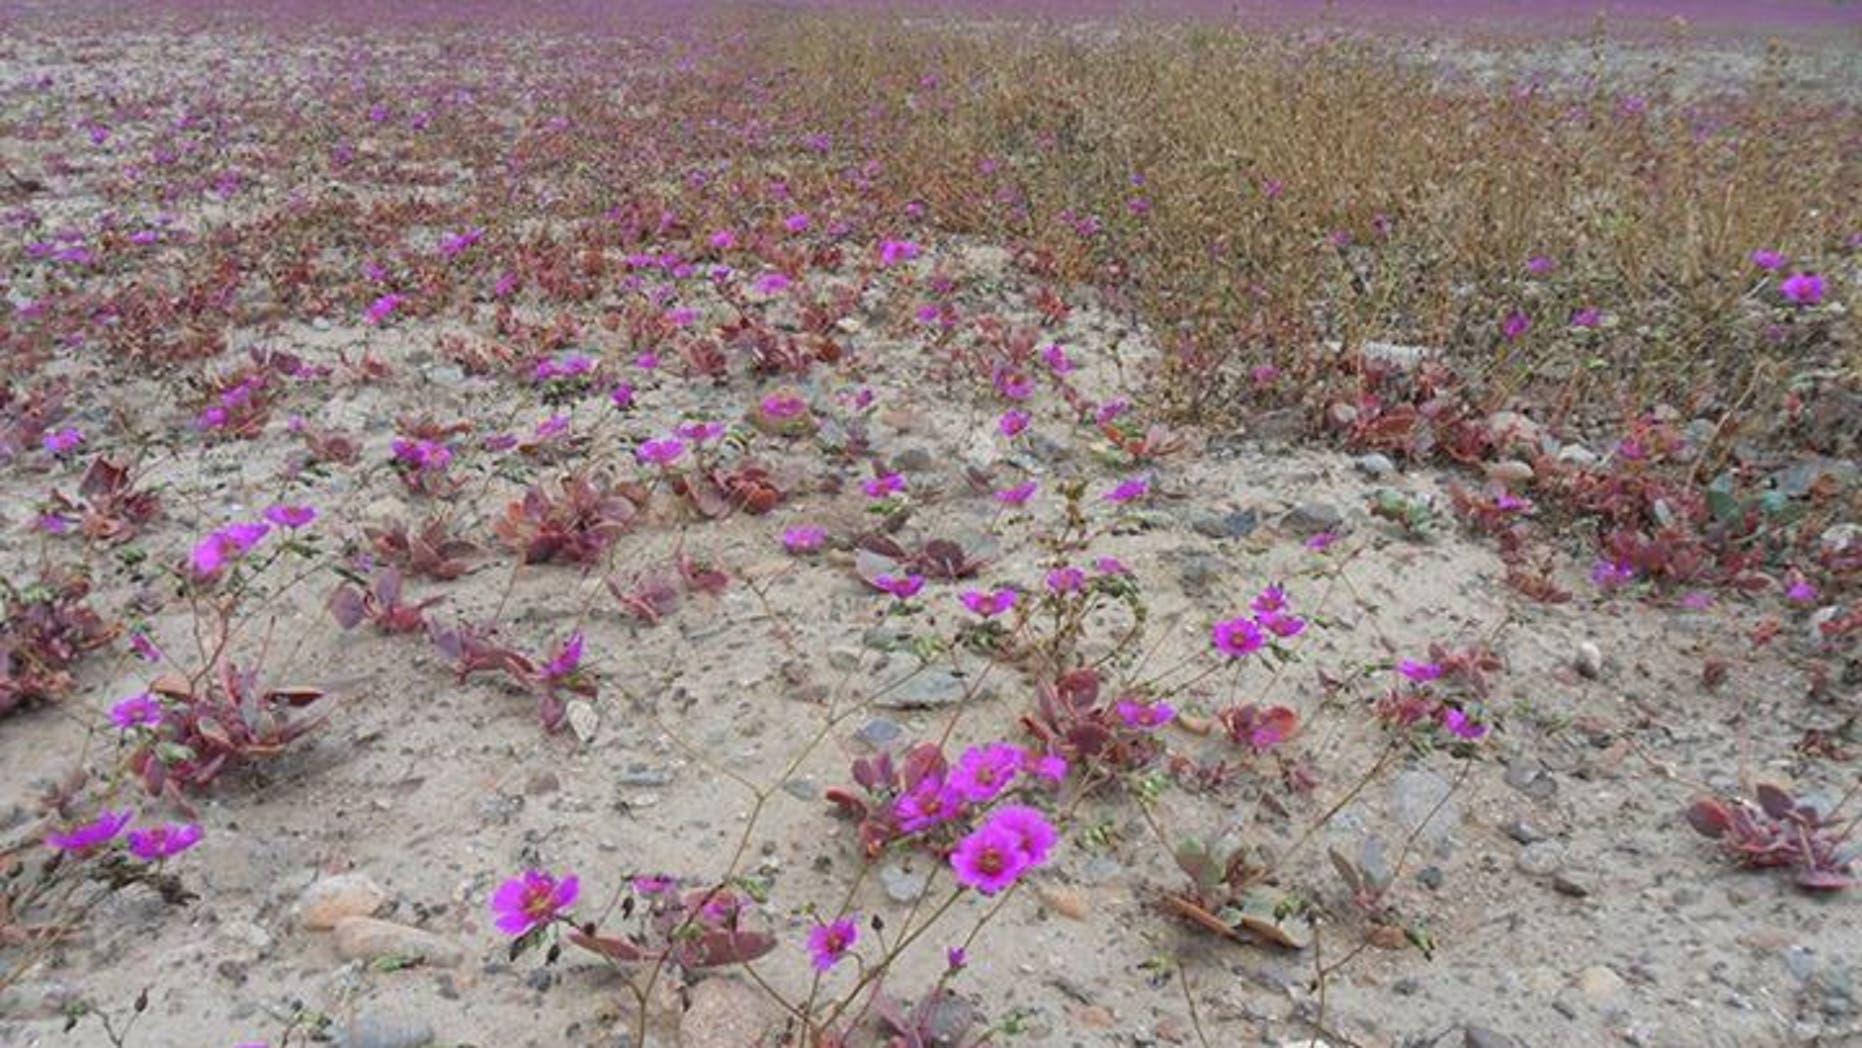 Wild flowers are covering huge stretches of the Atacama desert in Chile. (Photo Credit: Sebastéuo Fotografias)